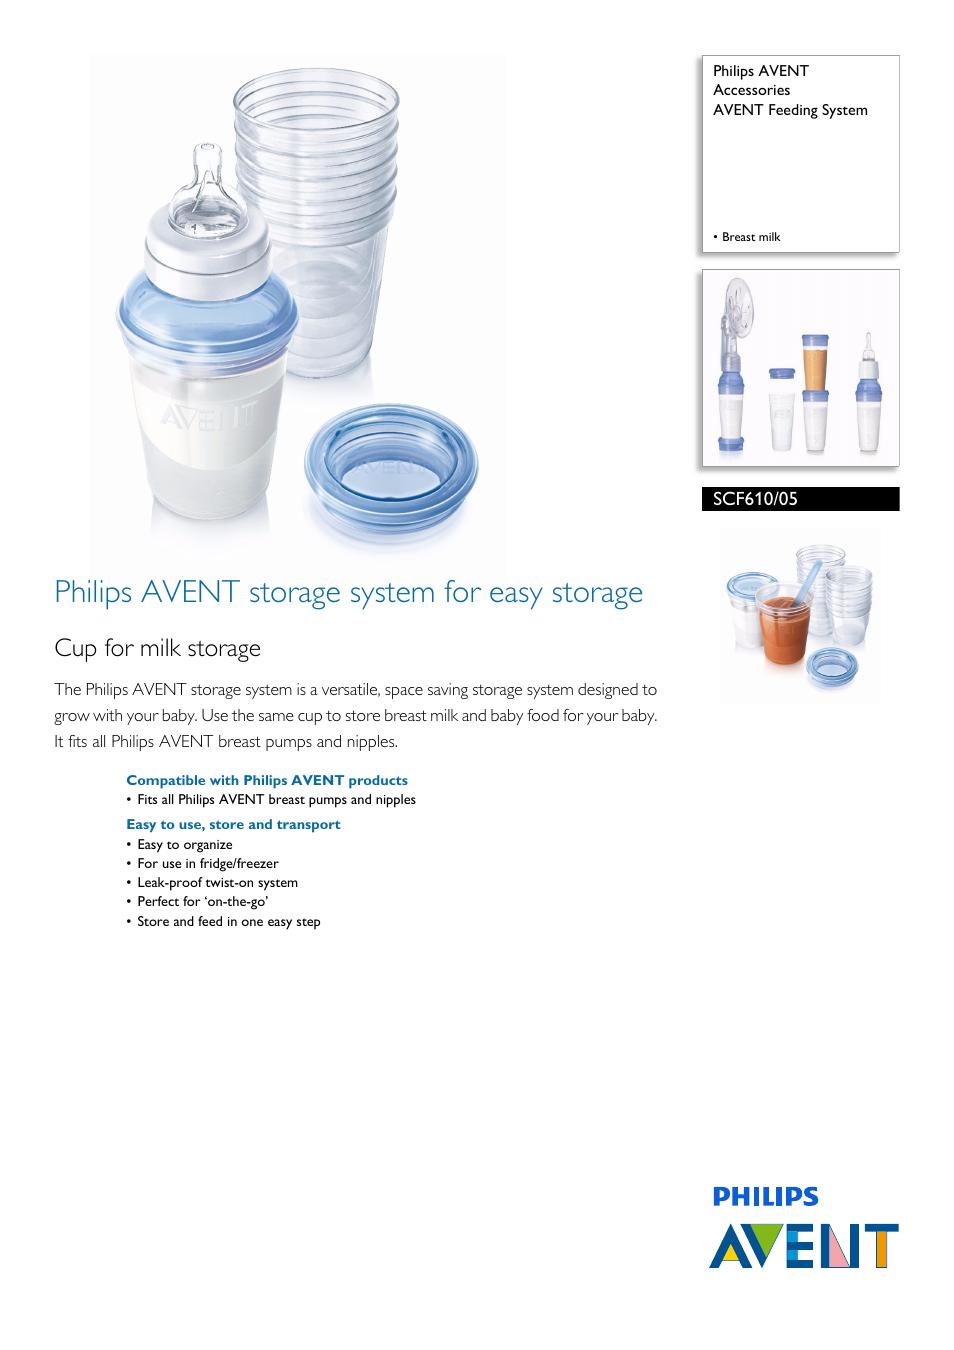 philips avent via manual breast pump